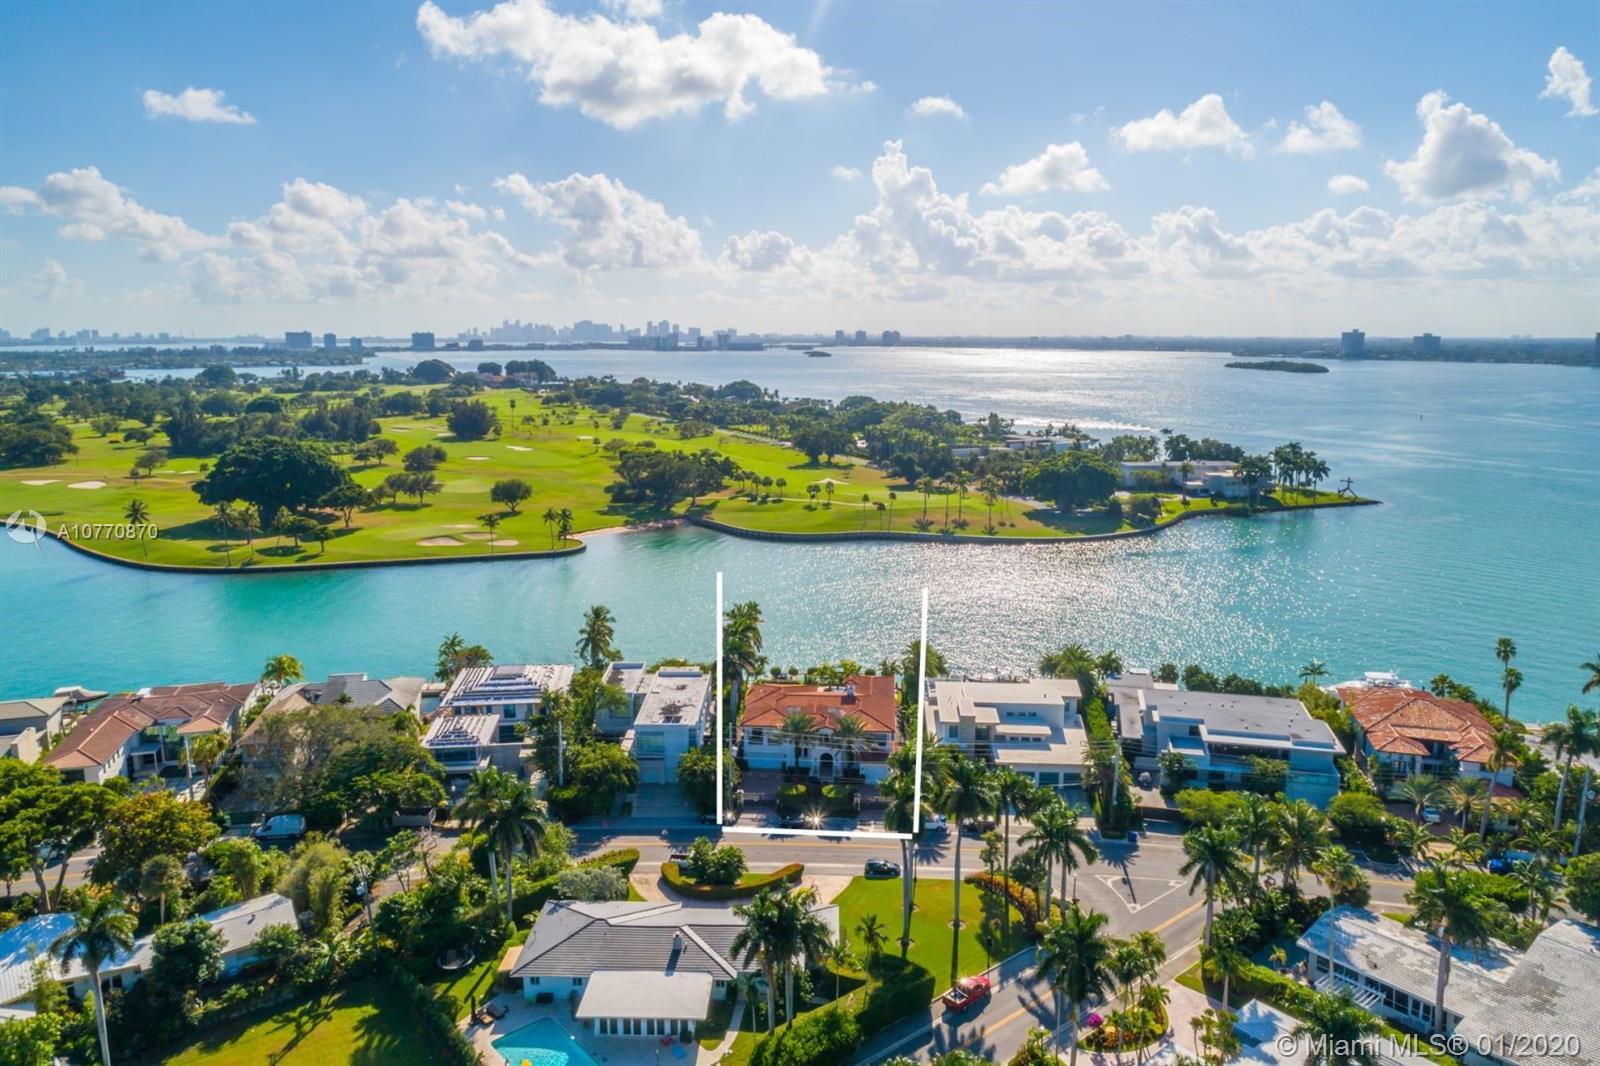 9440 W Broadview Dr, Bay Harbor Islands, FL 33154 - Bay Harbor Islands, FL real estate listing